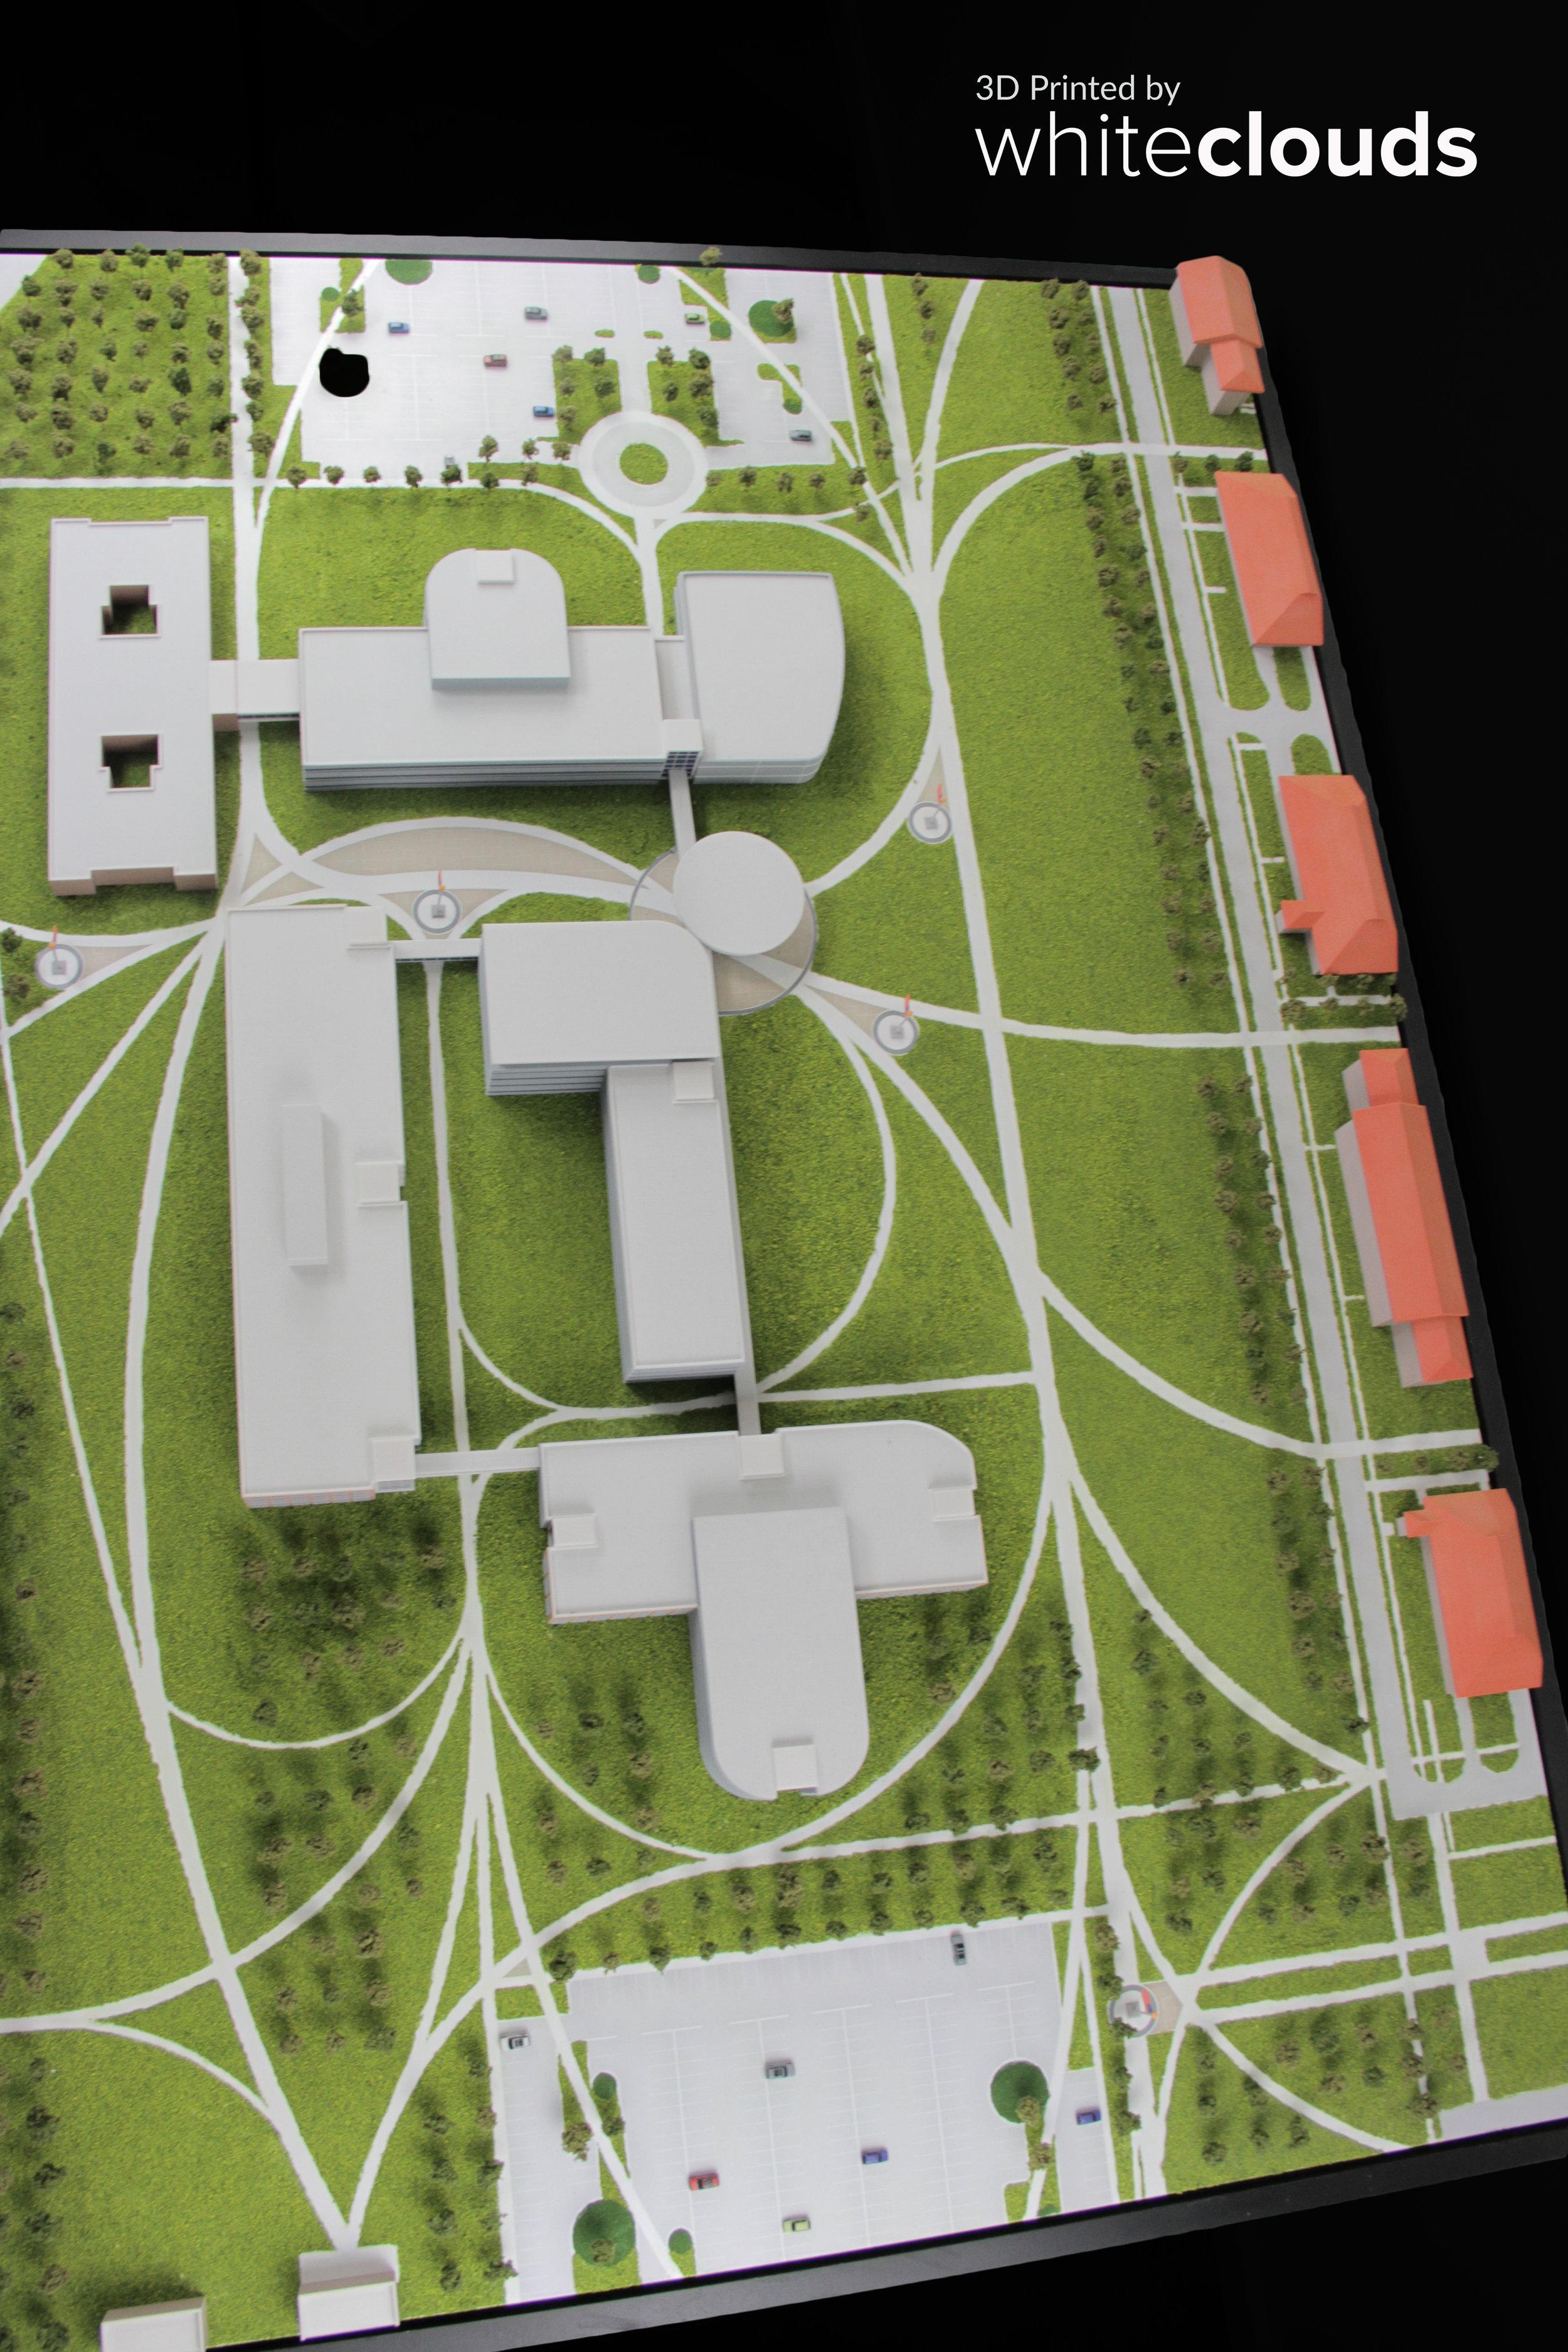 3D-Printed-WhiteClouds-Fort-Gordon-Architecture-Fort-Gordon-Website-3.JPG